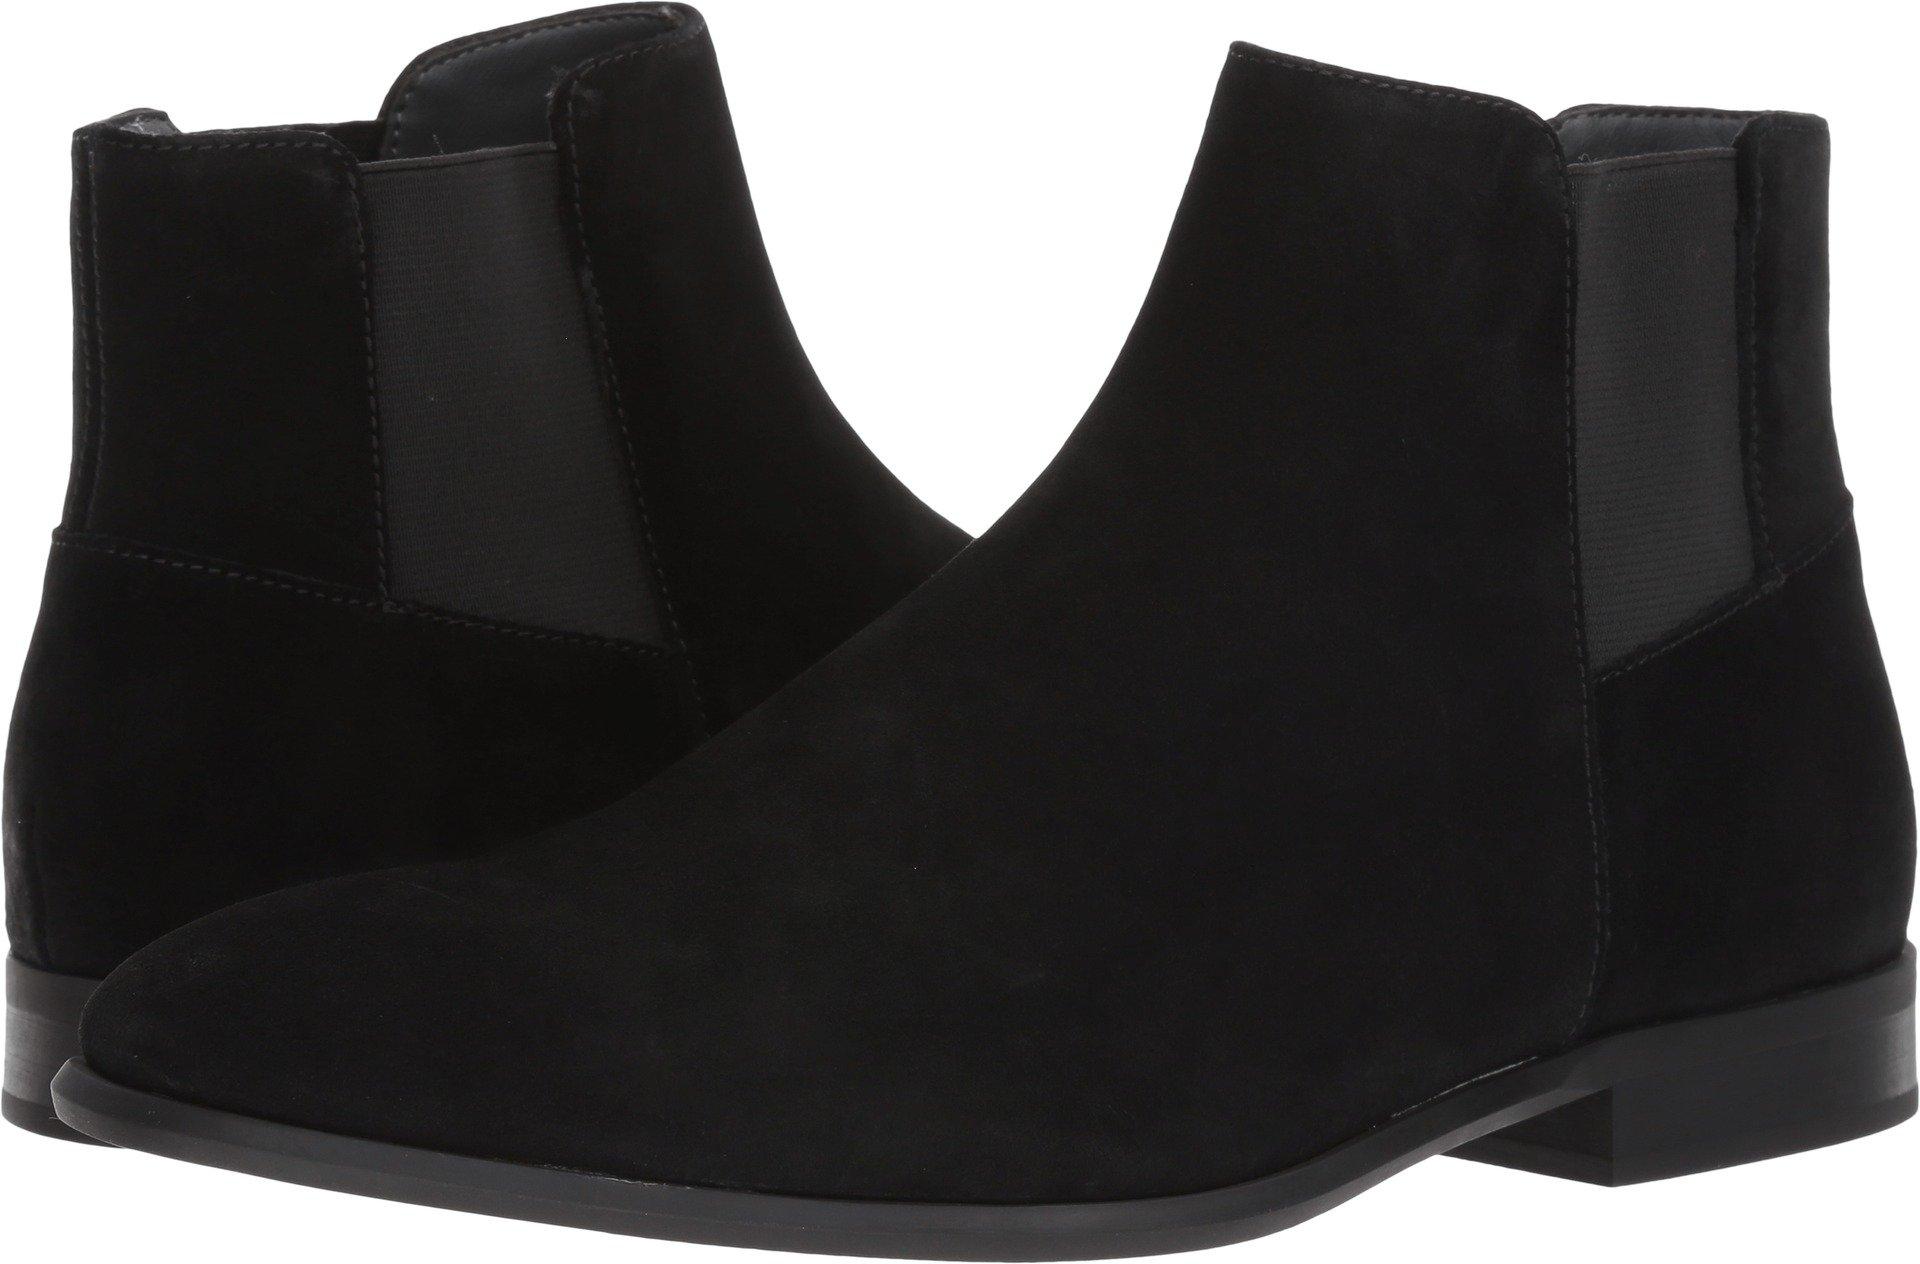 Calvin Klein Men's Larry Calf Suede Ankle Bootie, Black, 9.5 M US